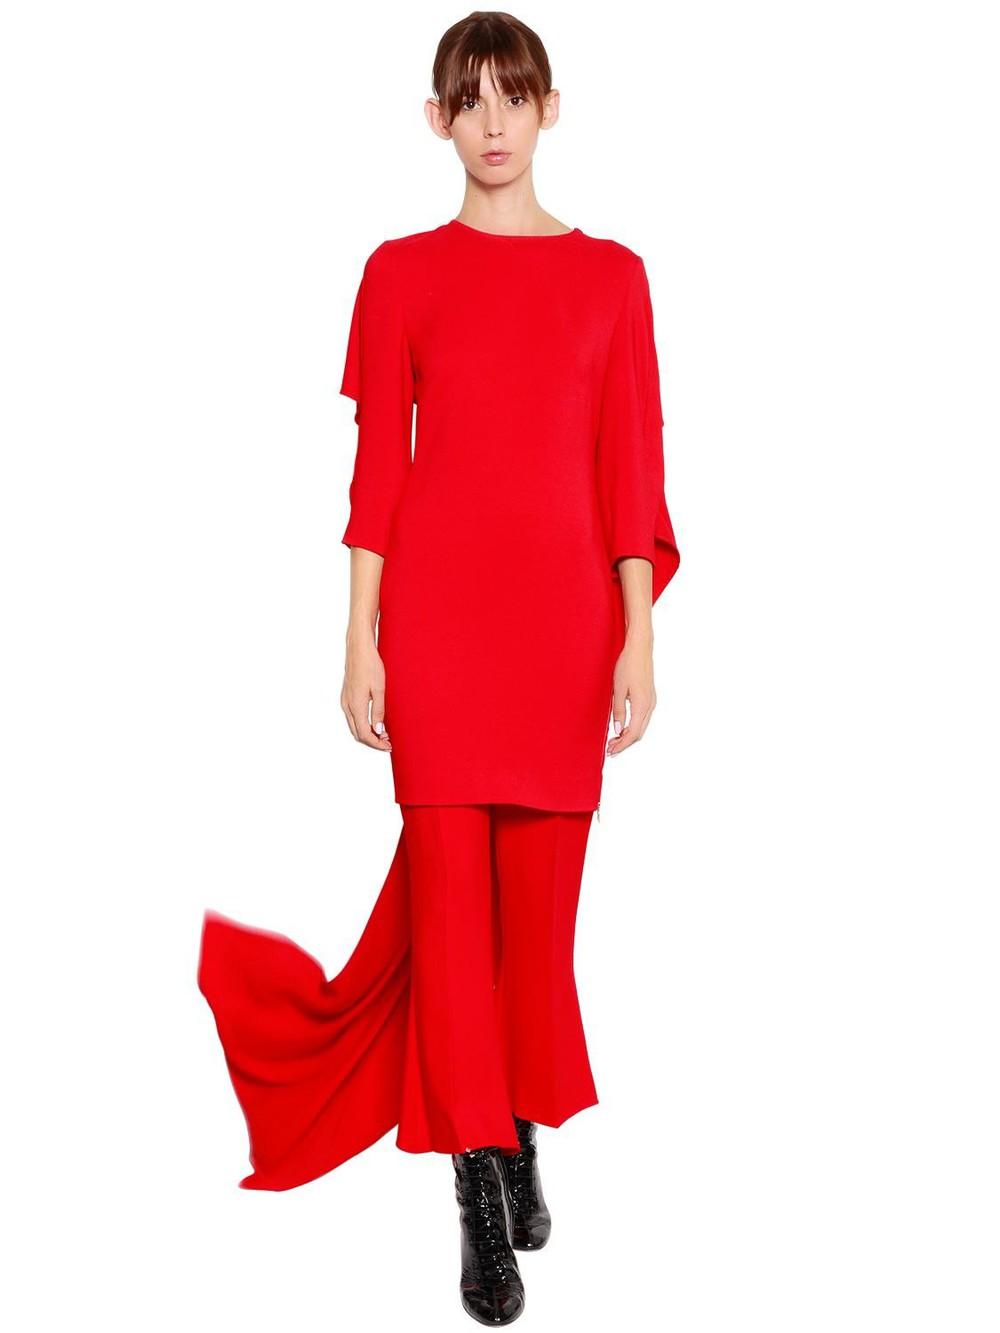 ANTONIO BERARDI Cady Dress With Cape in red